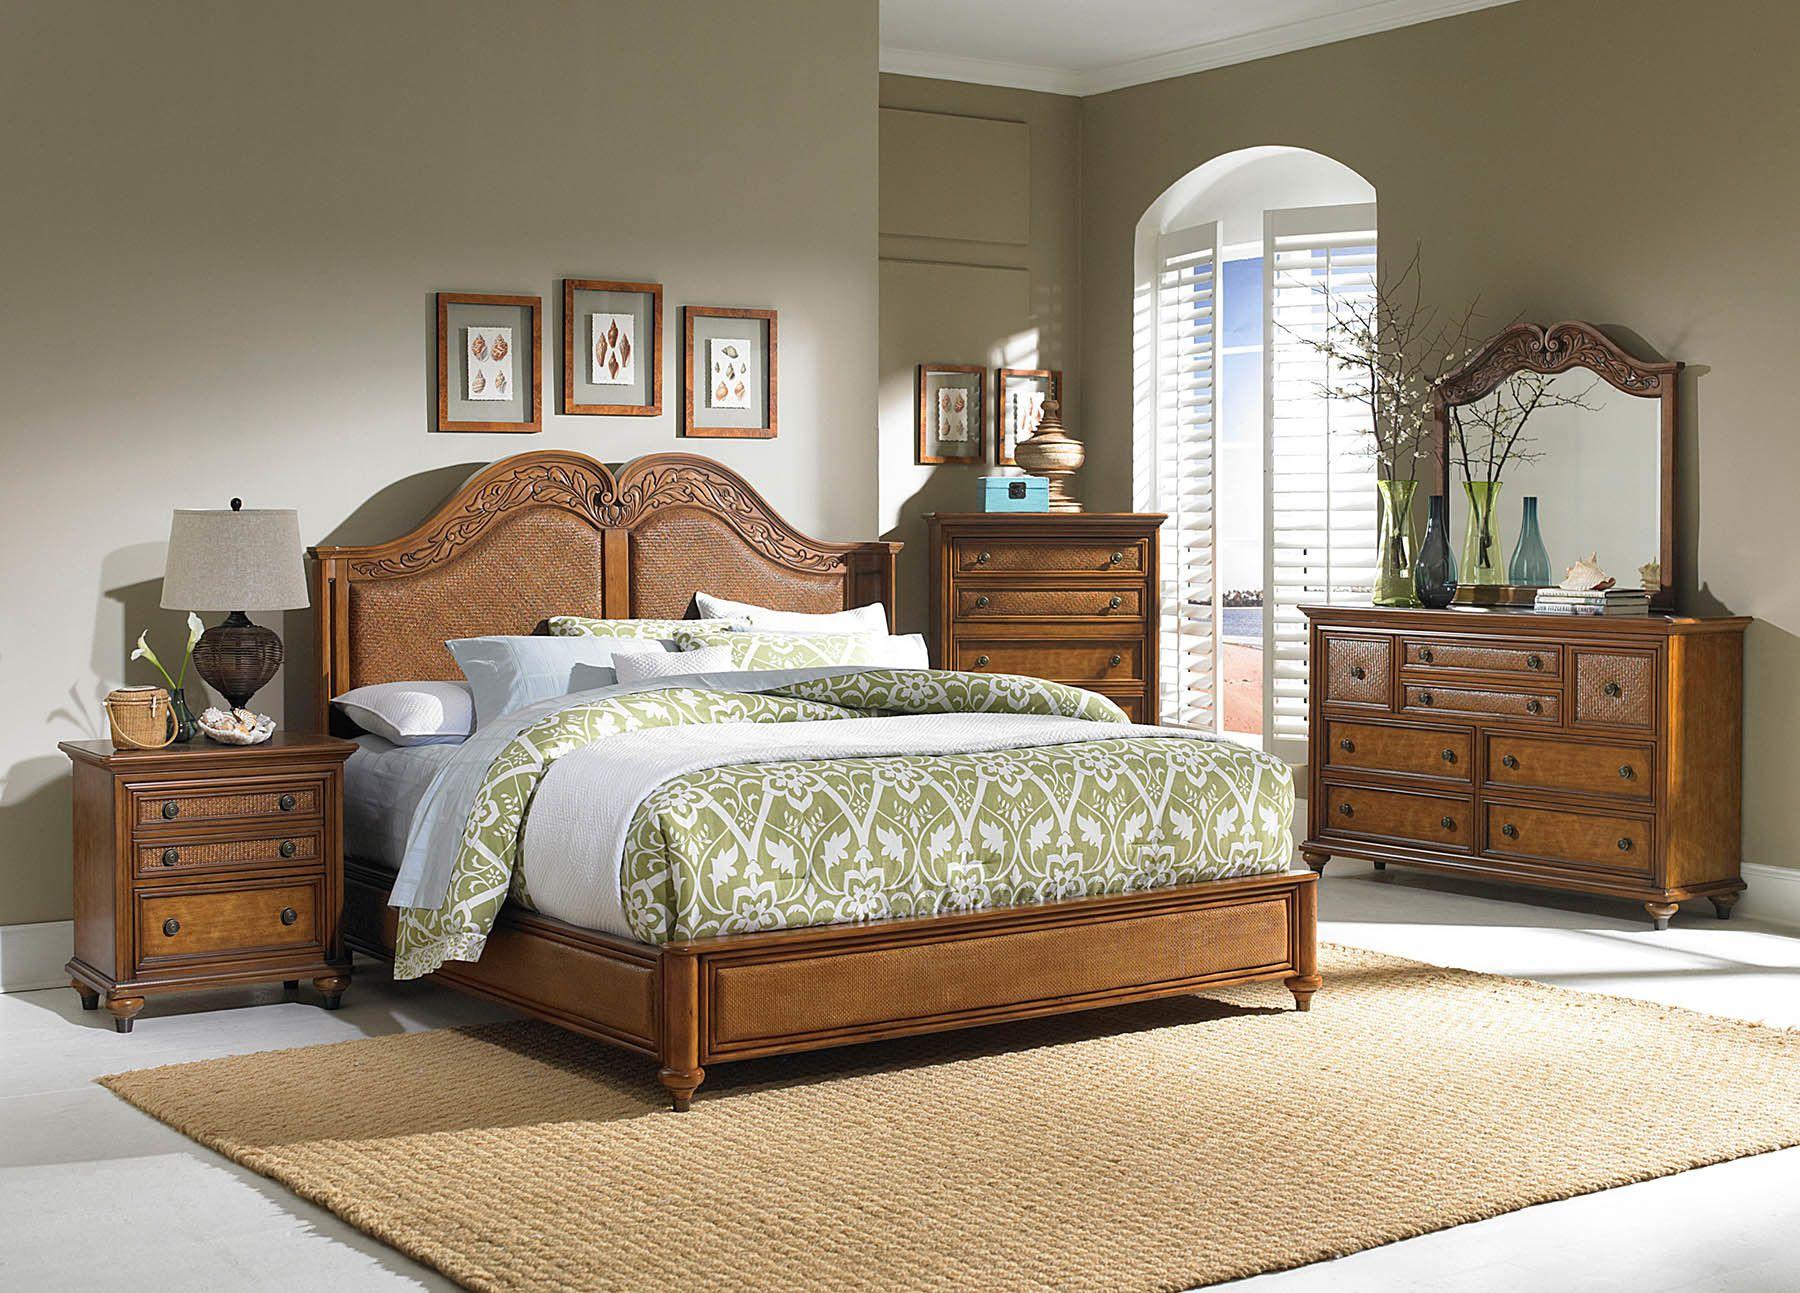 The Beautiful Wooden Bed Headboard With Beautiful Curving Apartement Architecture Bathroom Bedroom In 2020 Rustic Bedroom Design Headboards For Beds Bedroom Design